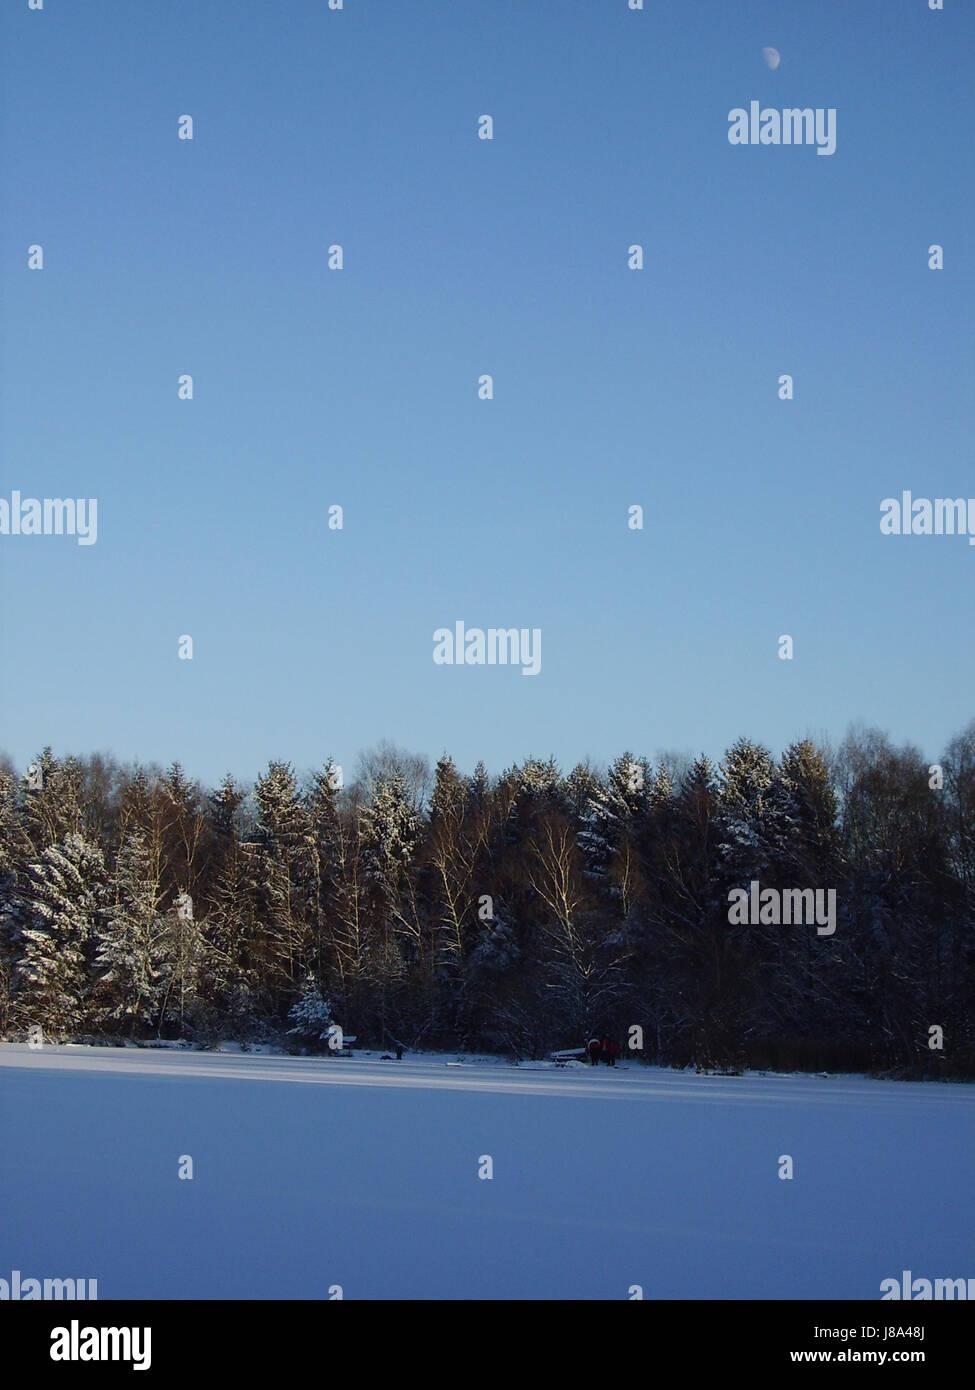 venekotensee in winter (3) Stock Photo